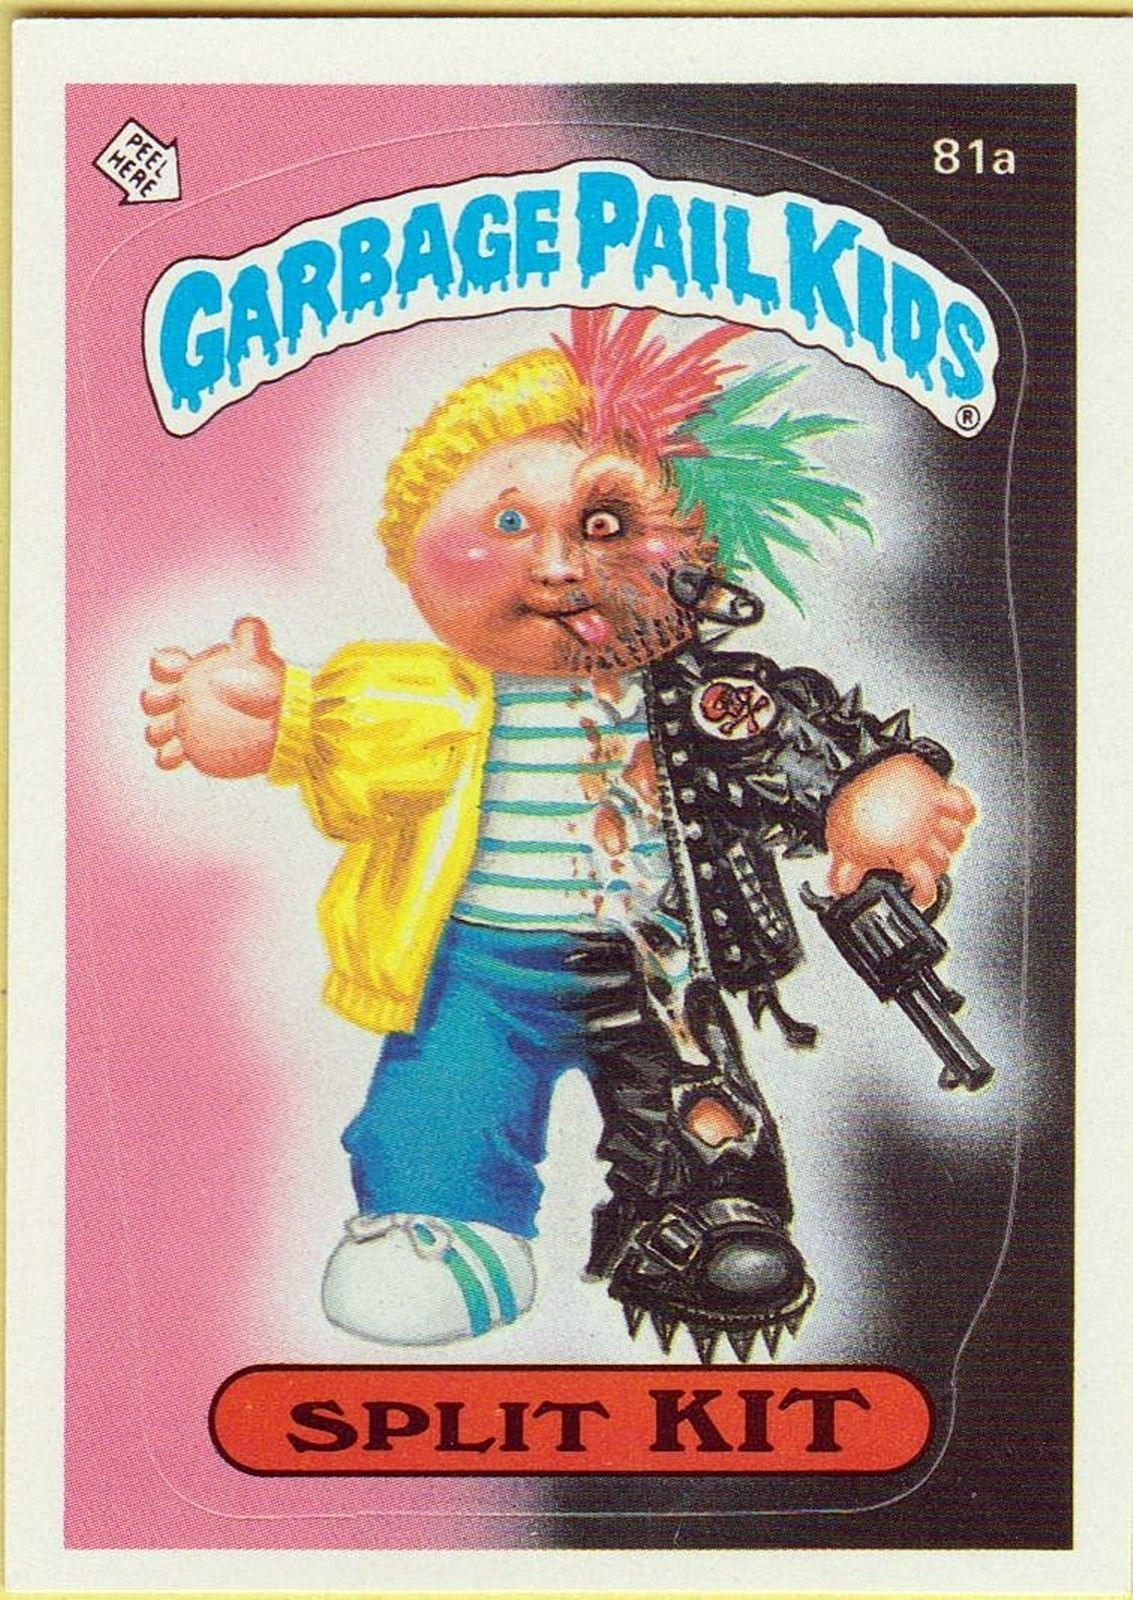 Garbage Pail Kids Garbage Pail Kids Garbage Pail Kids Cards Kids Series